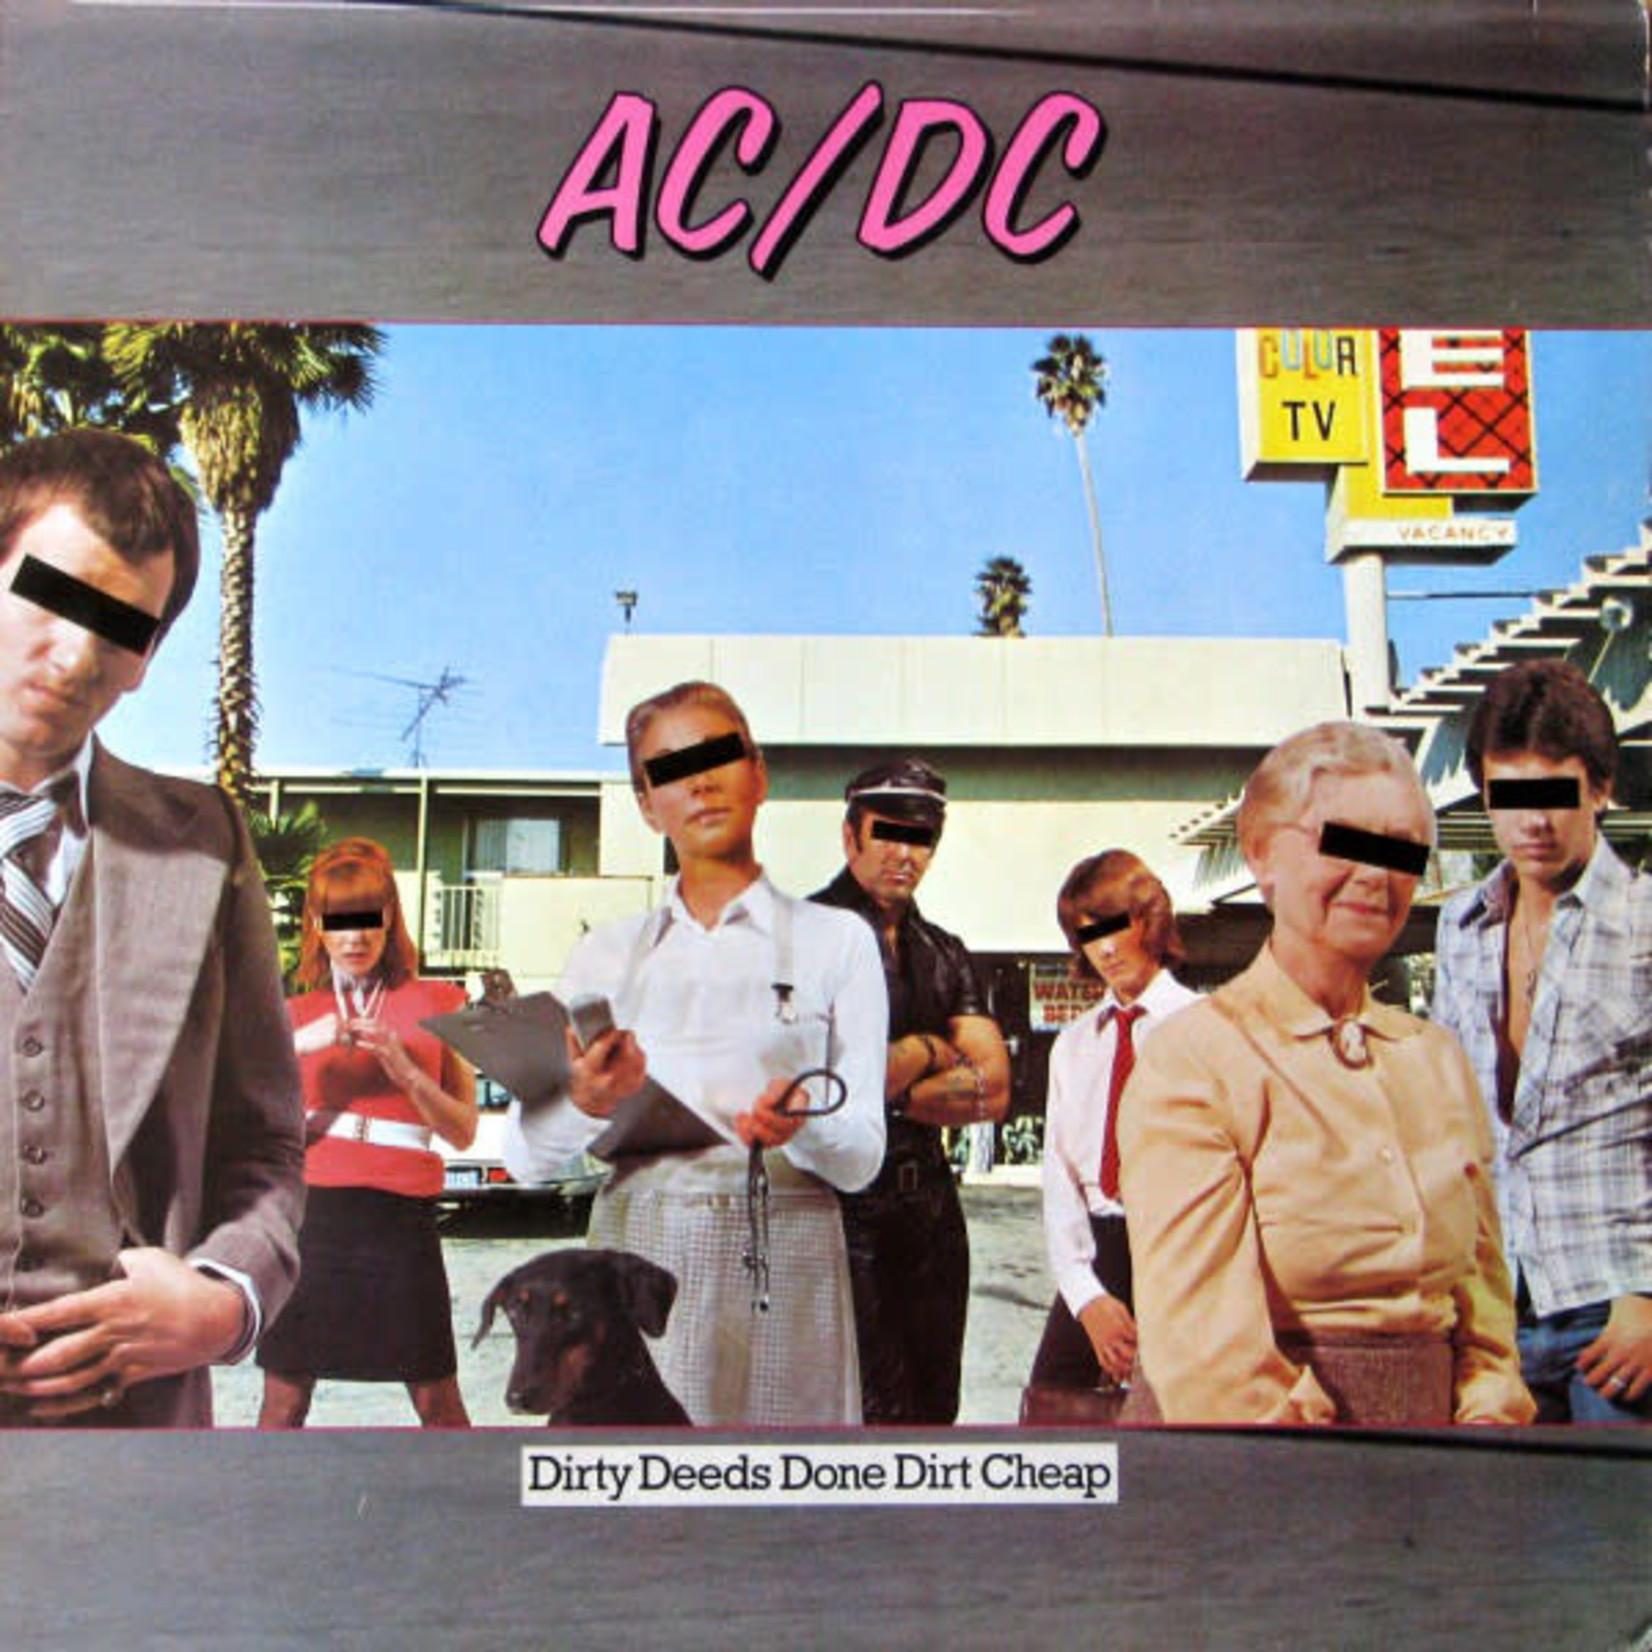 [Vintage] AC/DC: Dirty Deeds Done Dirt Cheap